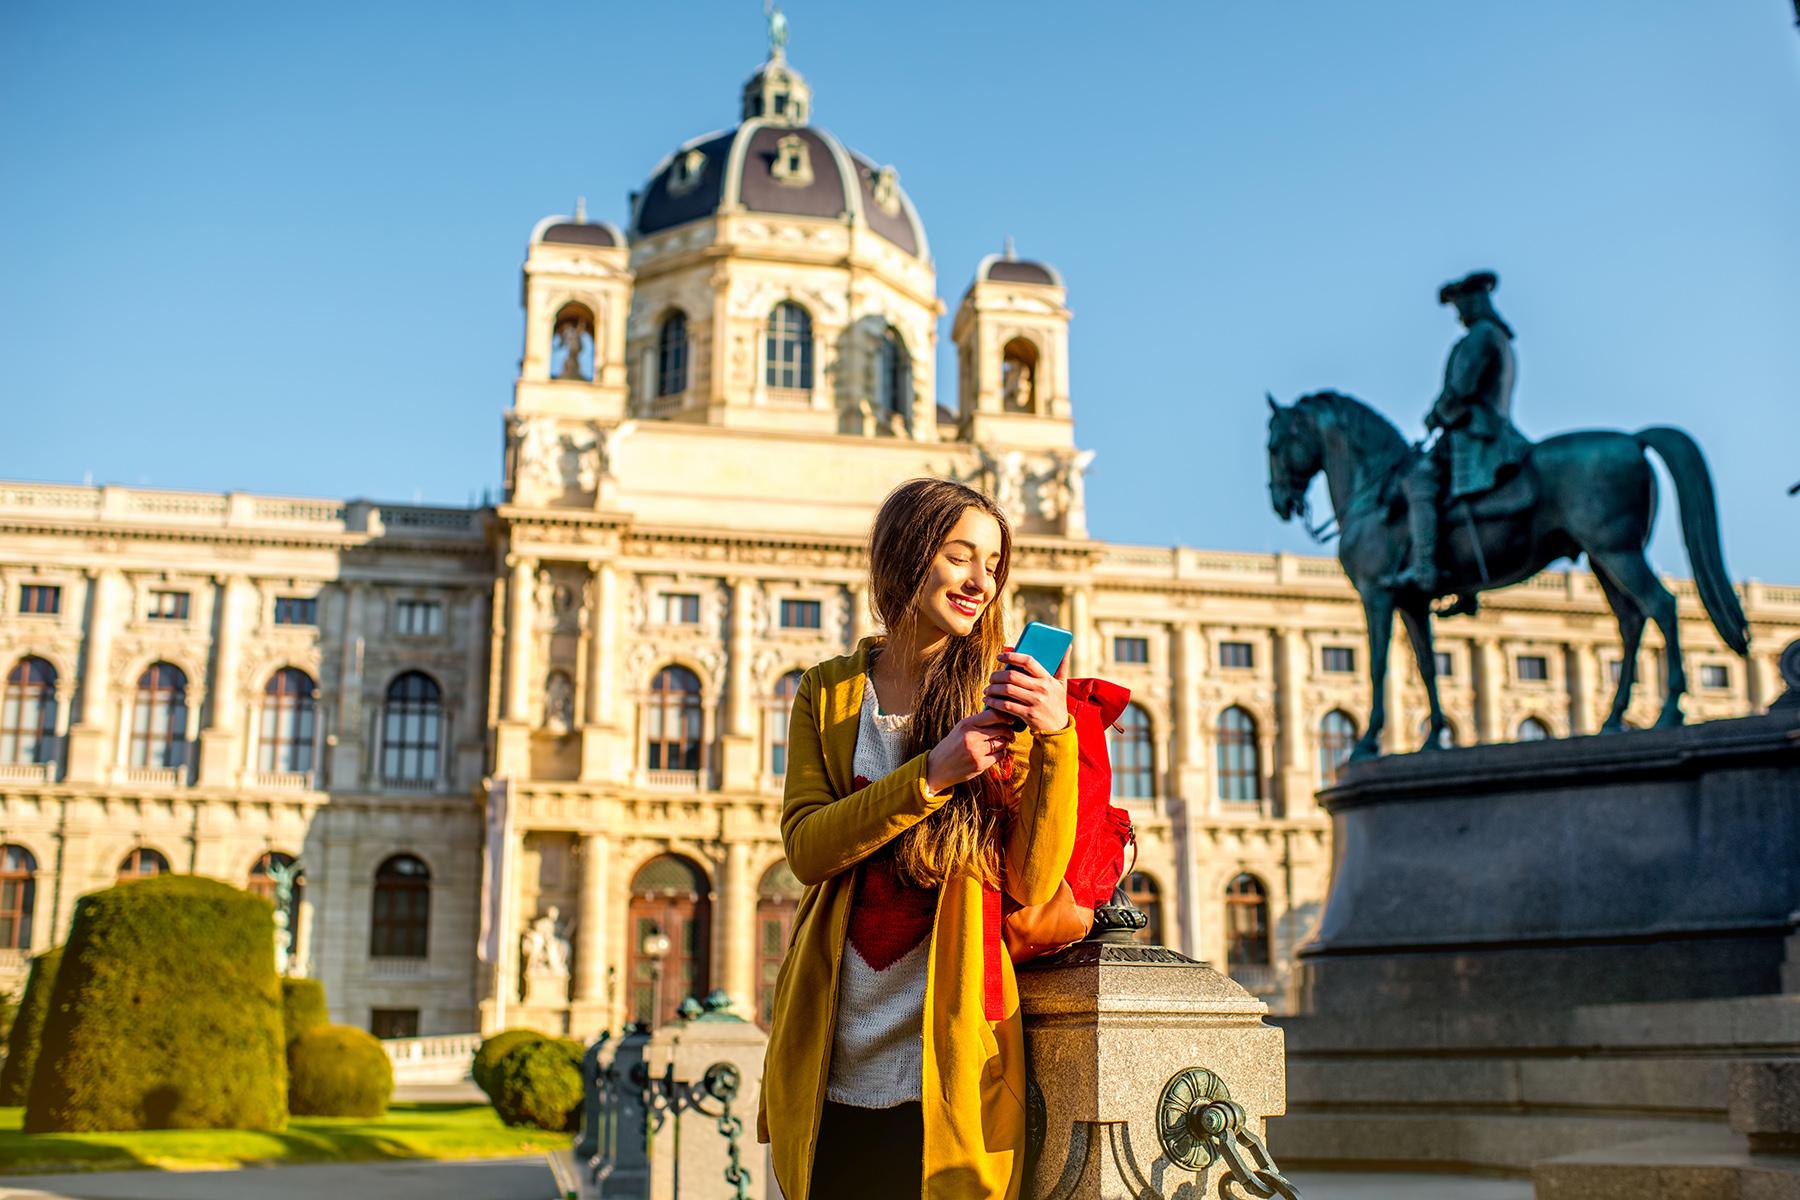 Mobile phone Vienna